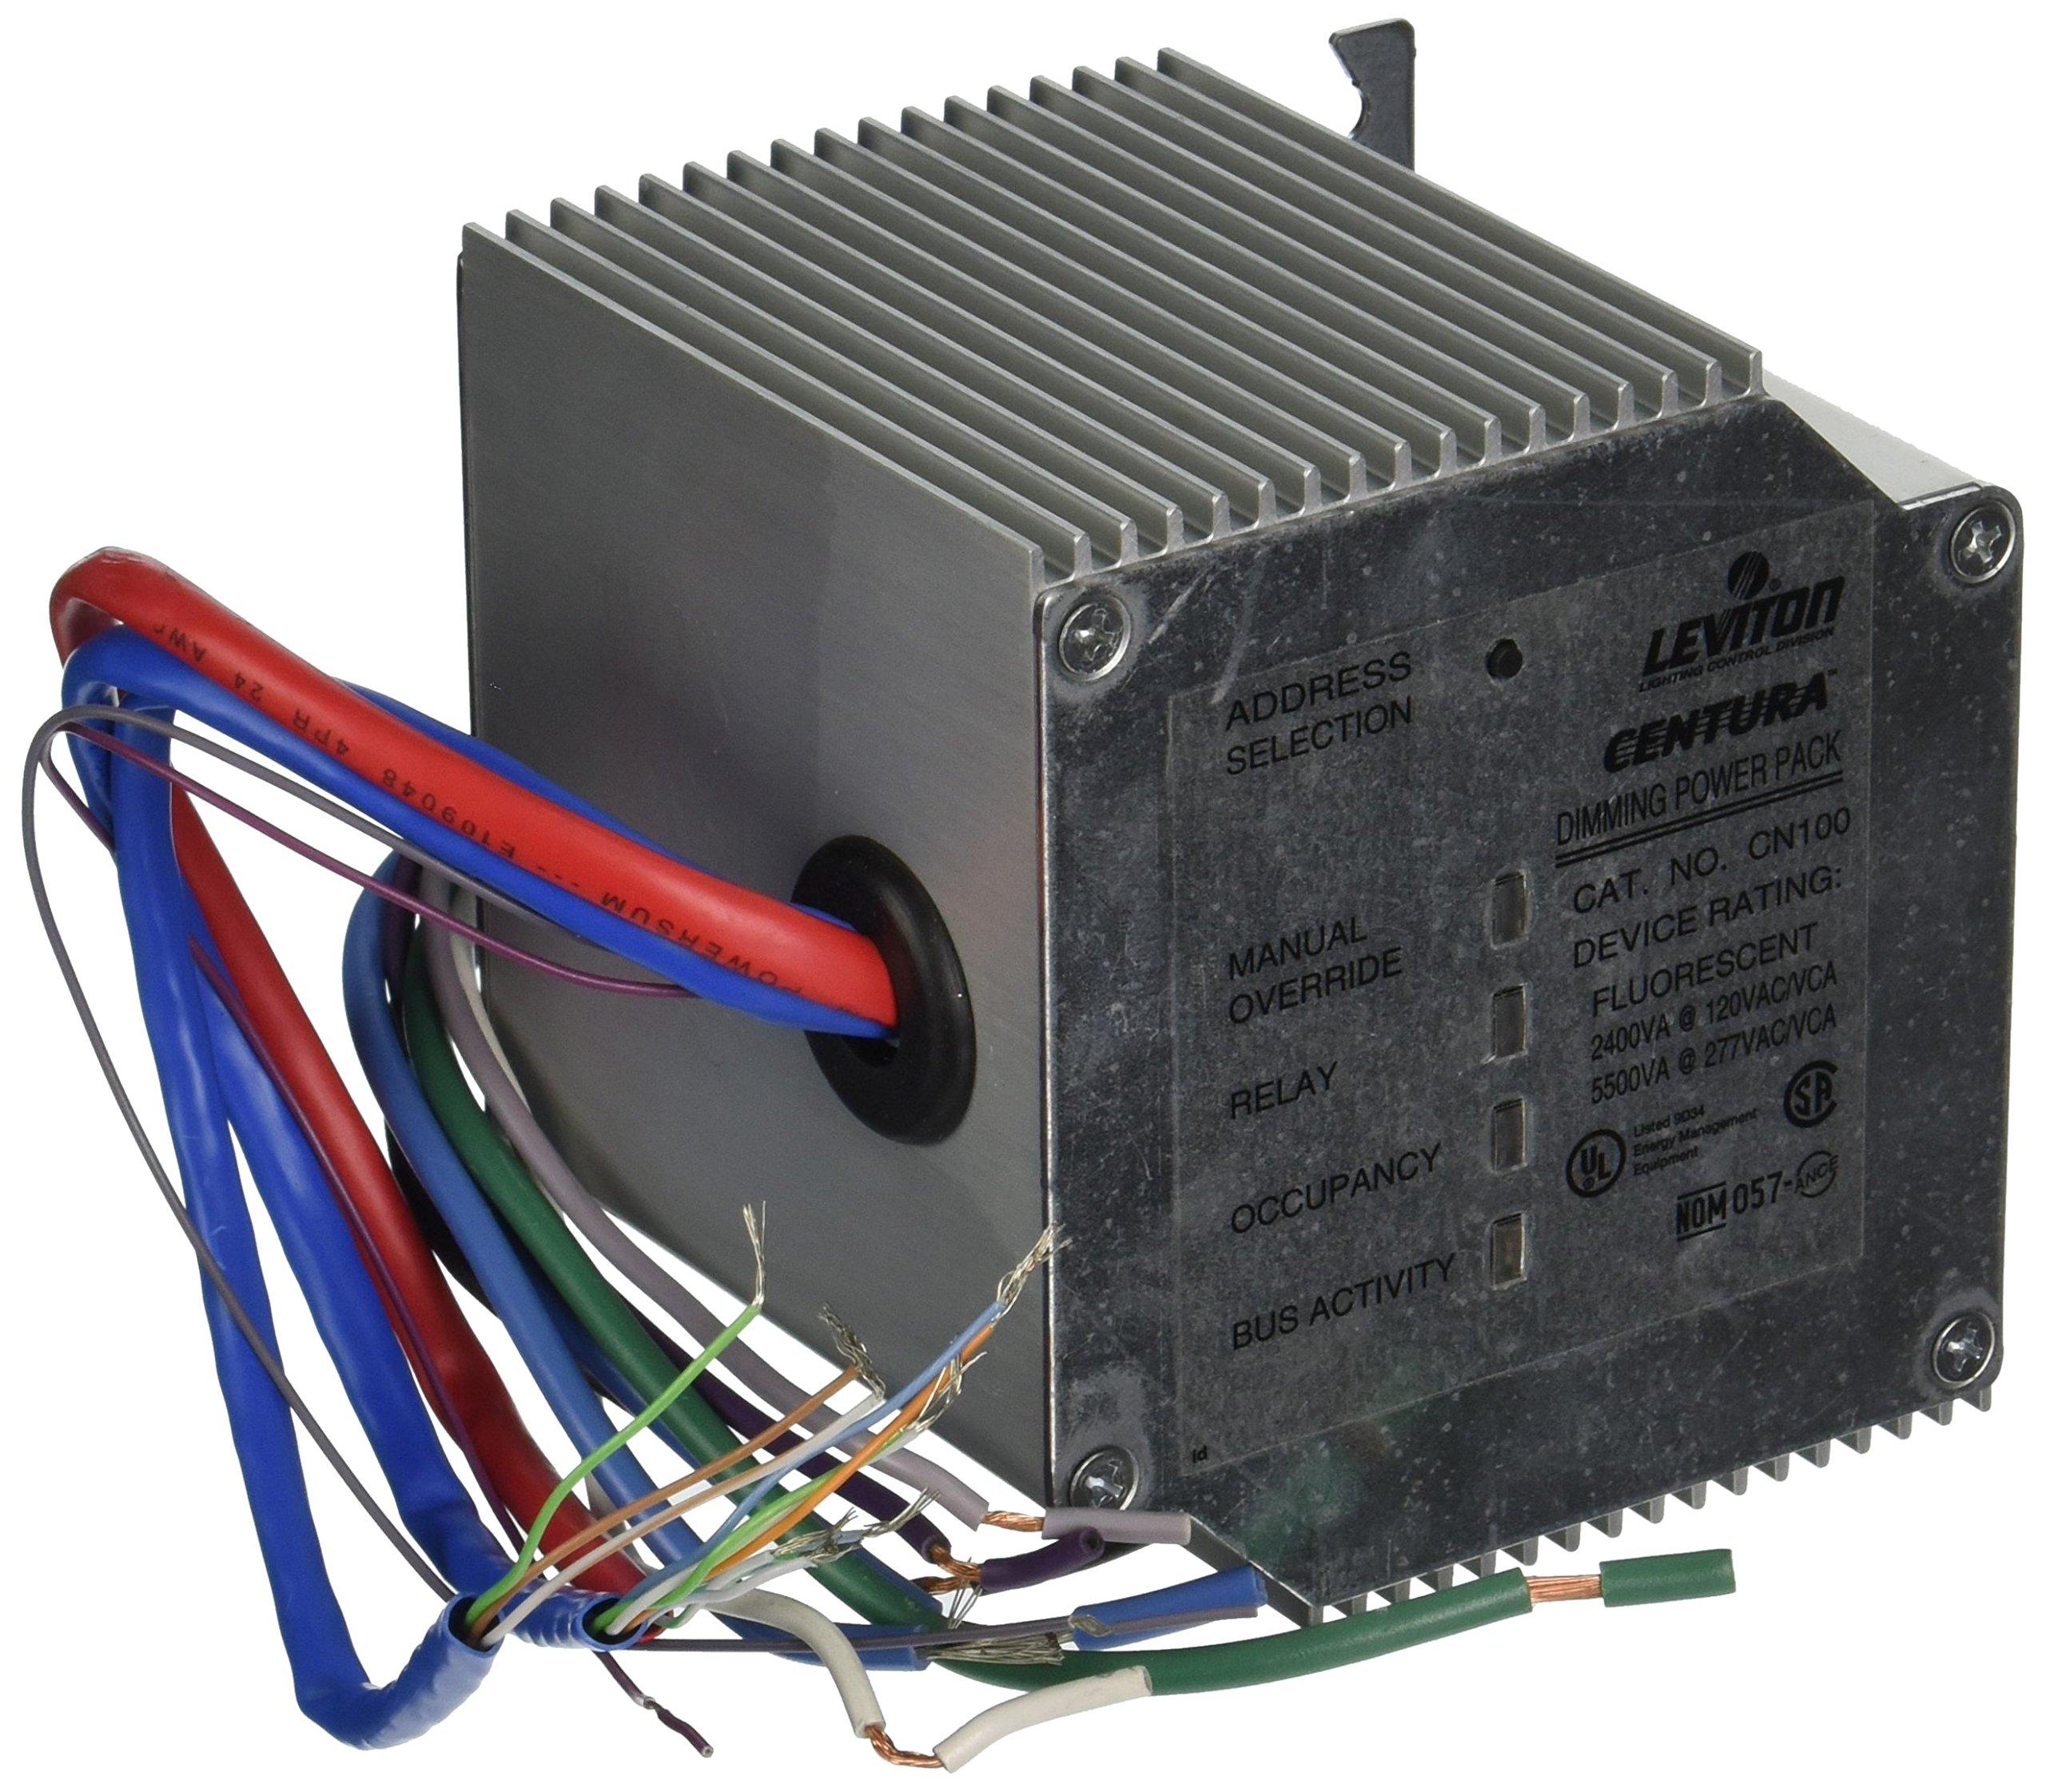 Leviton CN100-D0 Centura Dimming Power Pack for 0-10Vdc Dimming Fluorescent Ballast, Silver